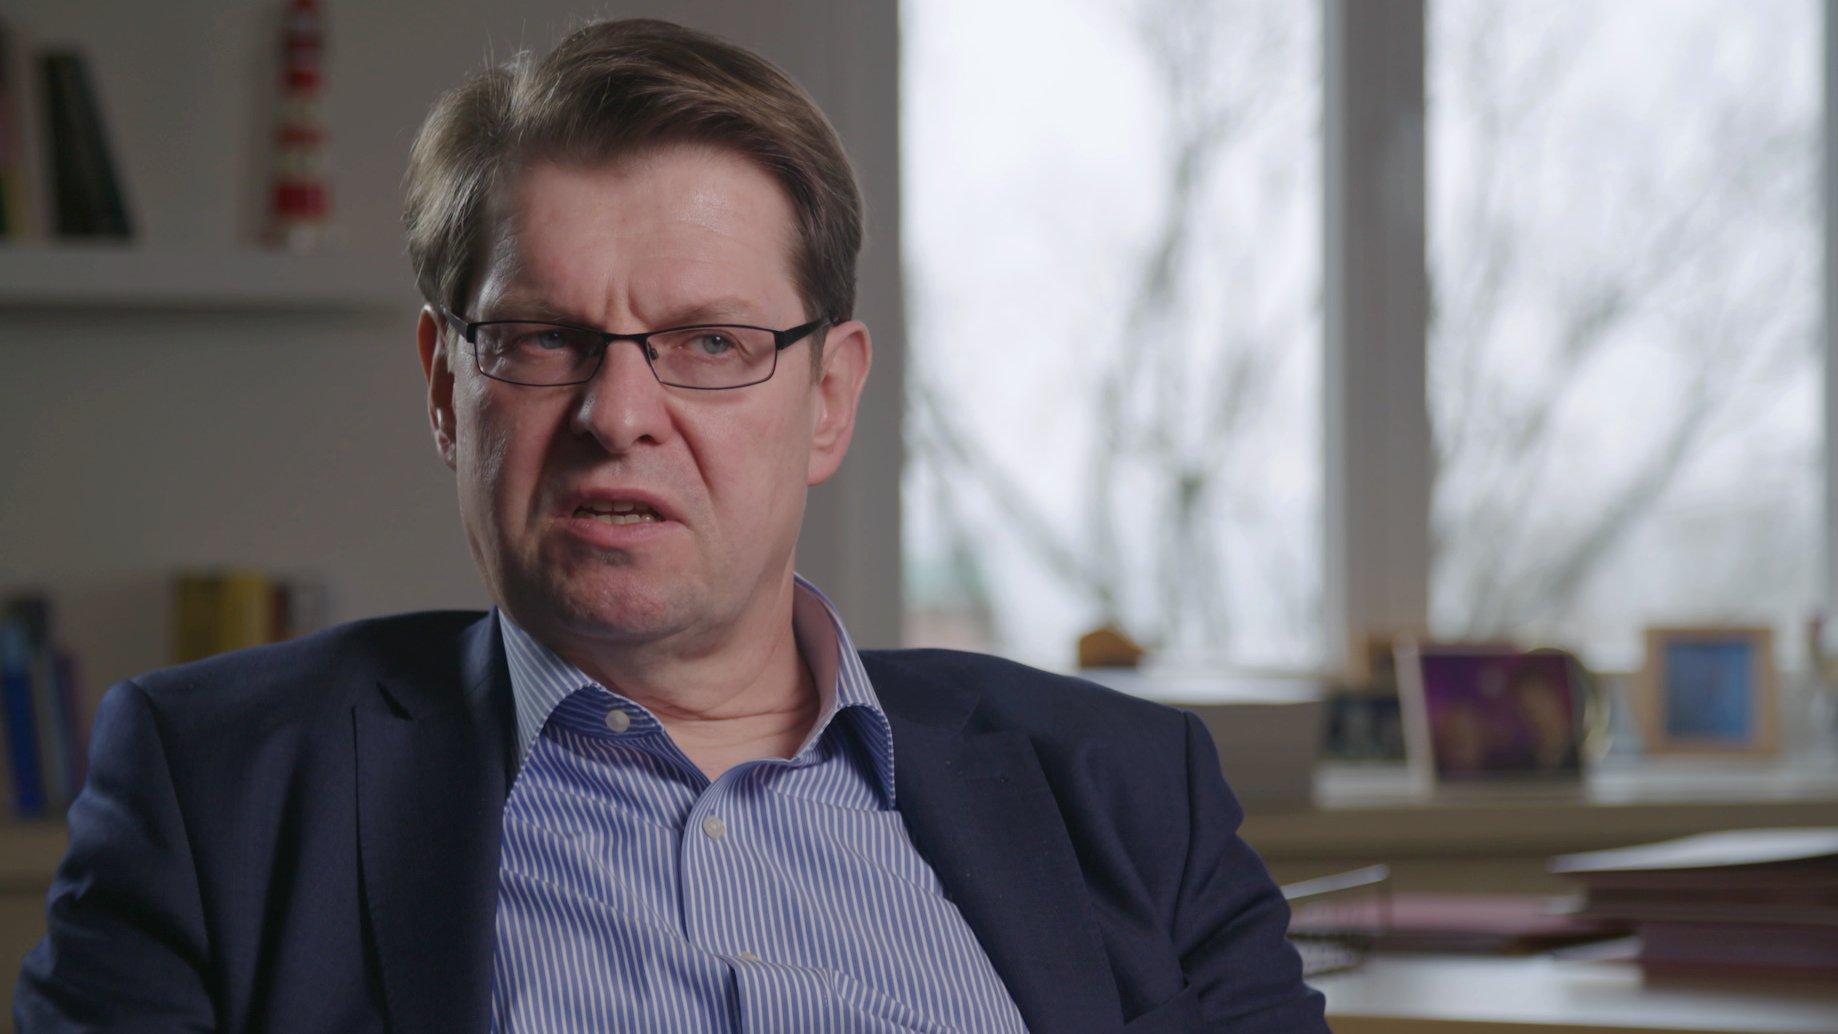 Ralf Stegner (SPD) über die AfD, 2016 (Video)